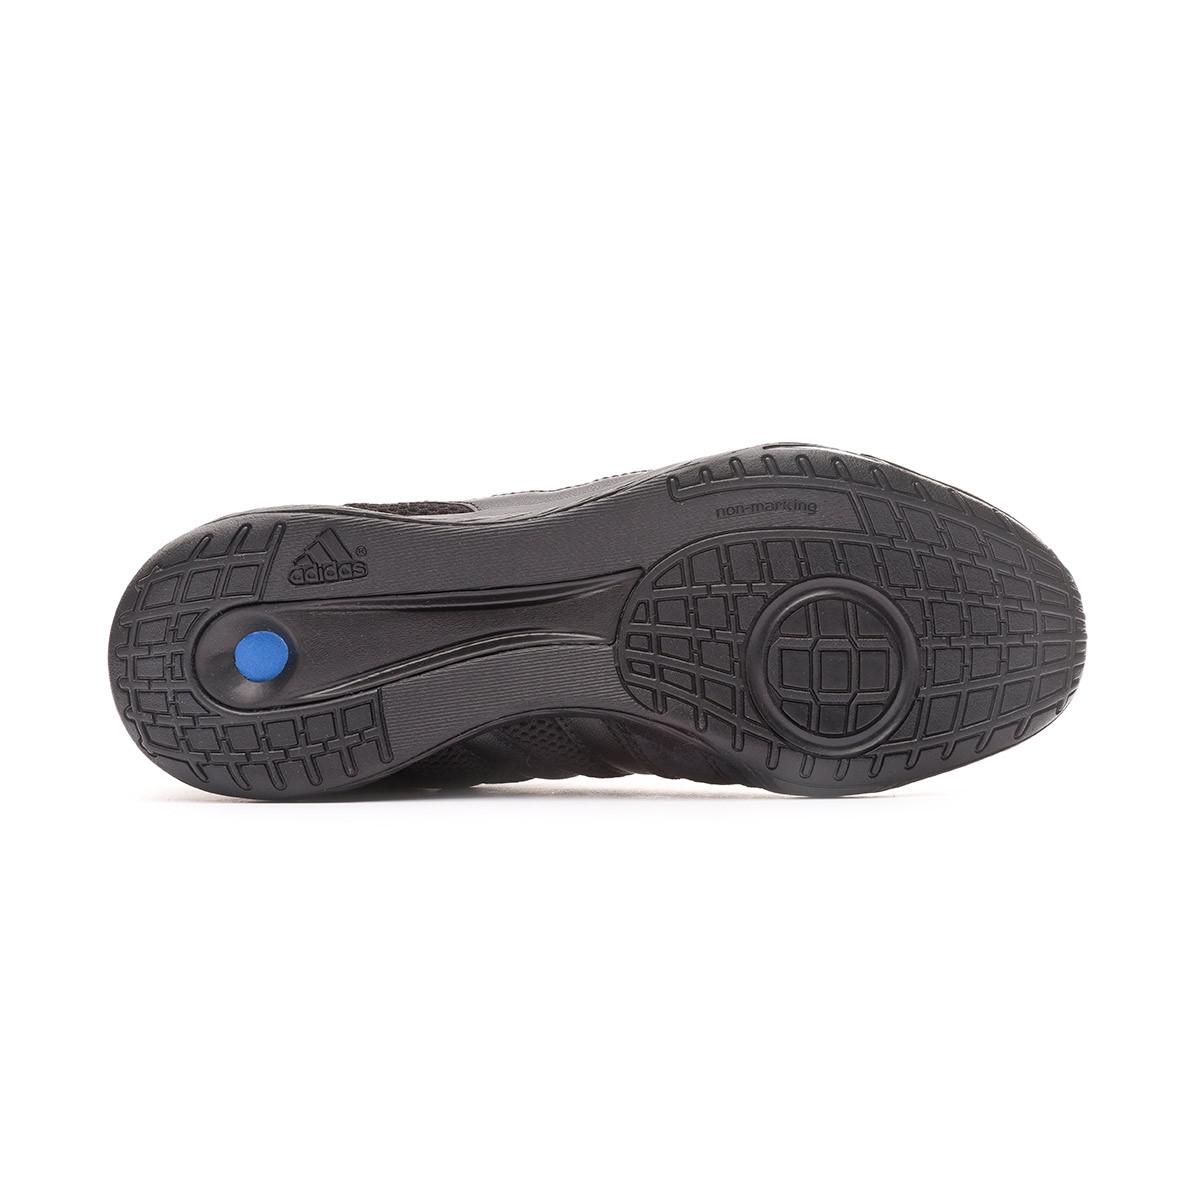 Bon Marché Adidas Ii Cuir Liftstyle Chaussures Vente De Pays